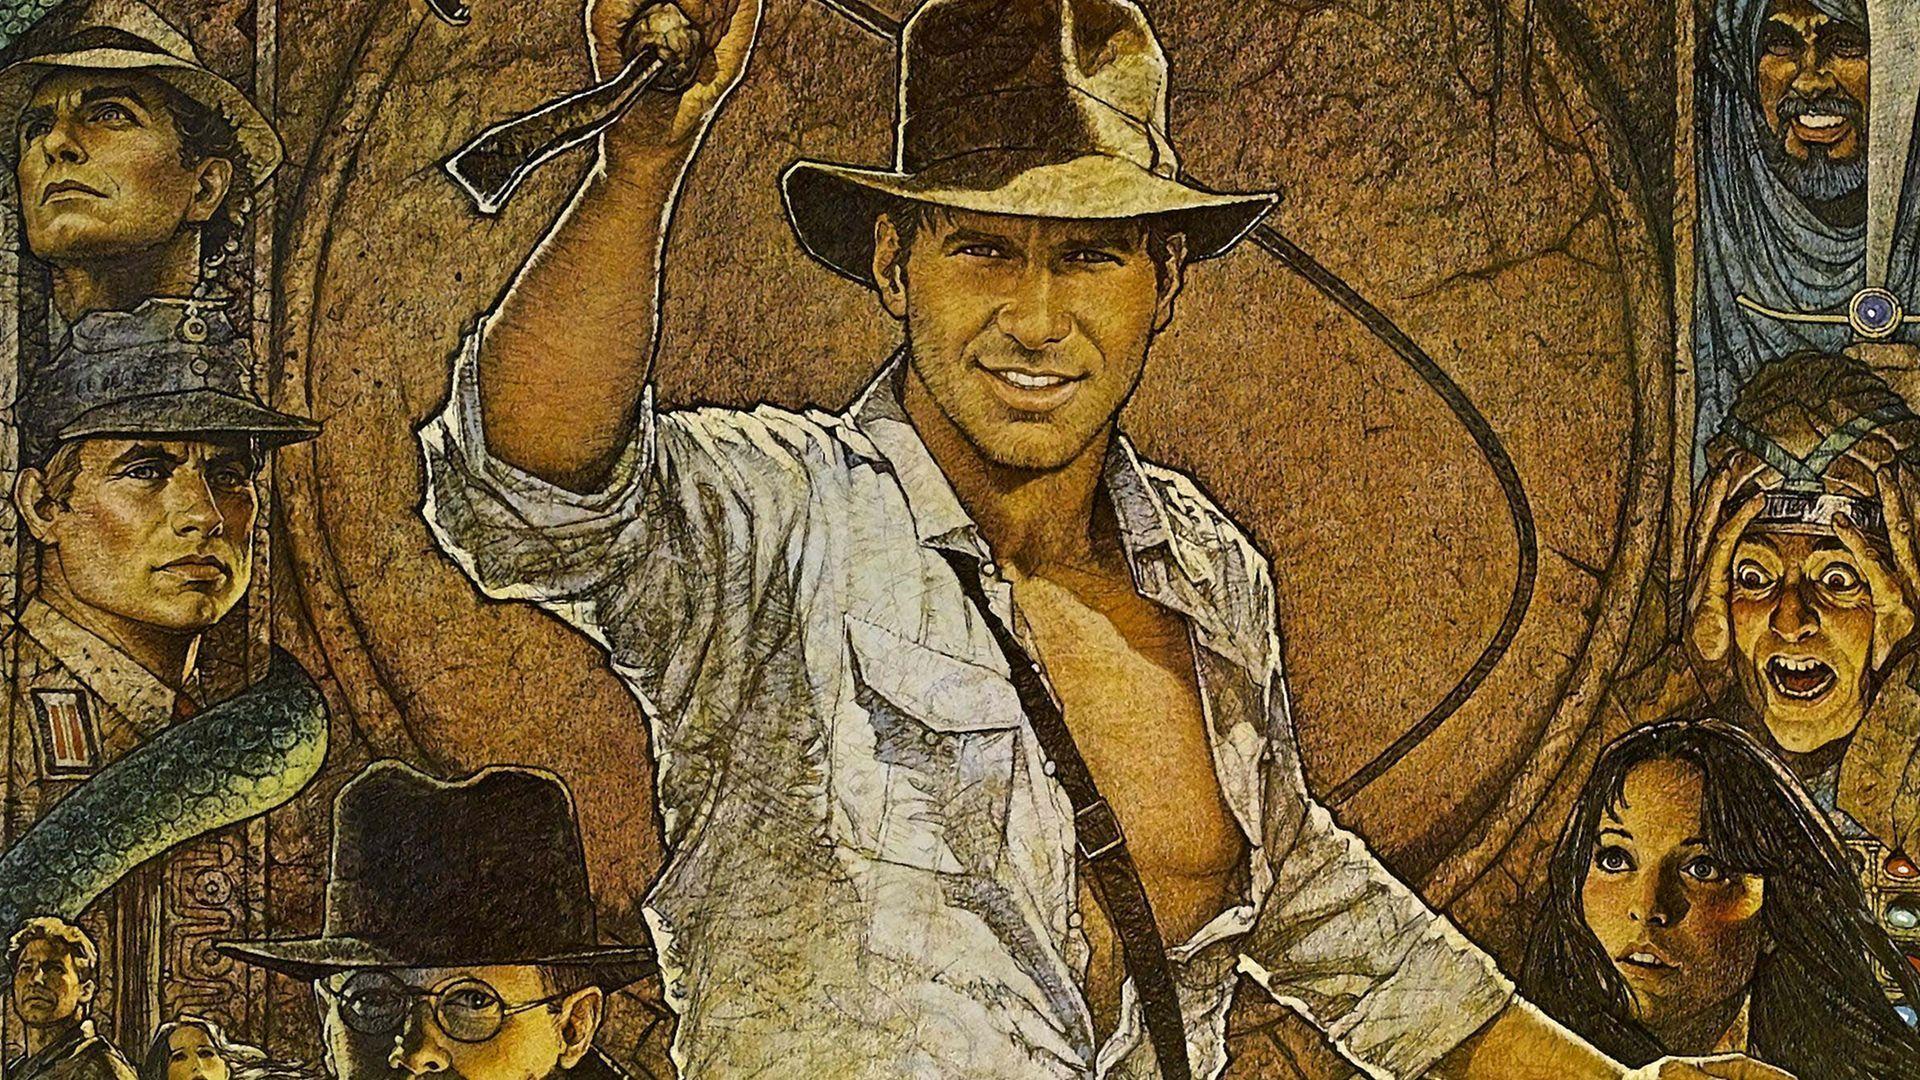 Harrison Ford says Indiana Jones 5 will shoot next year